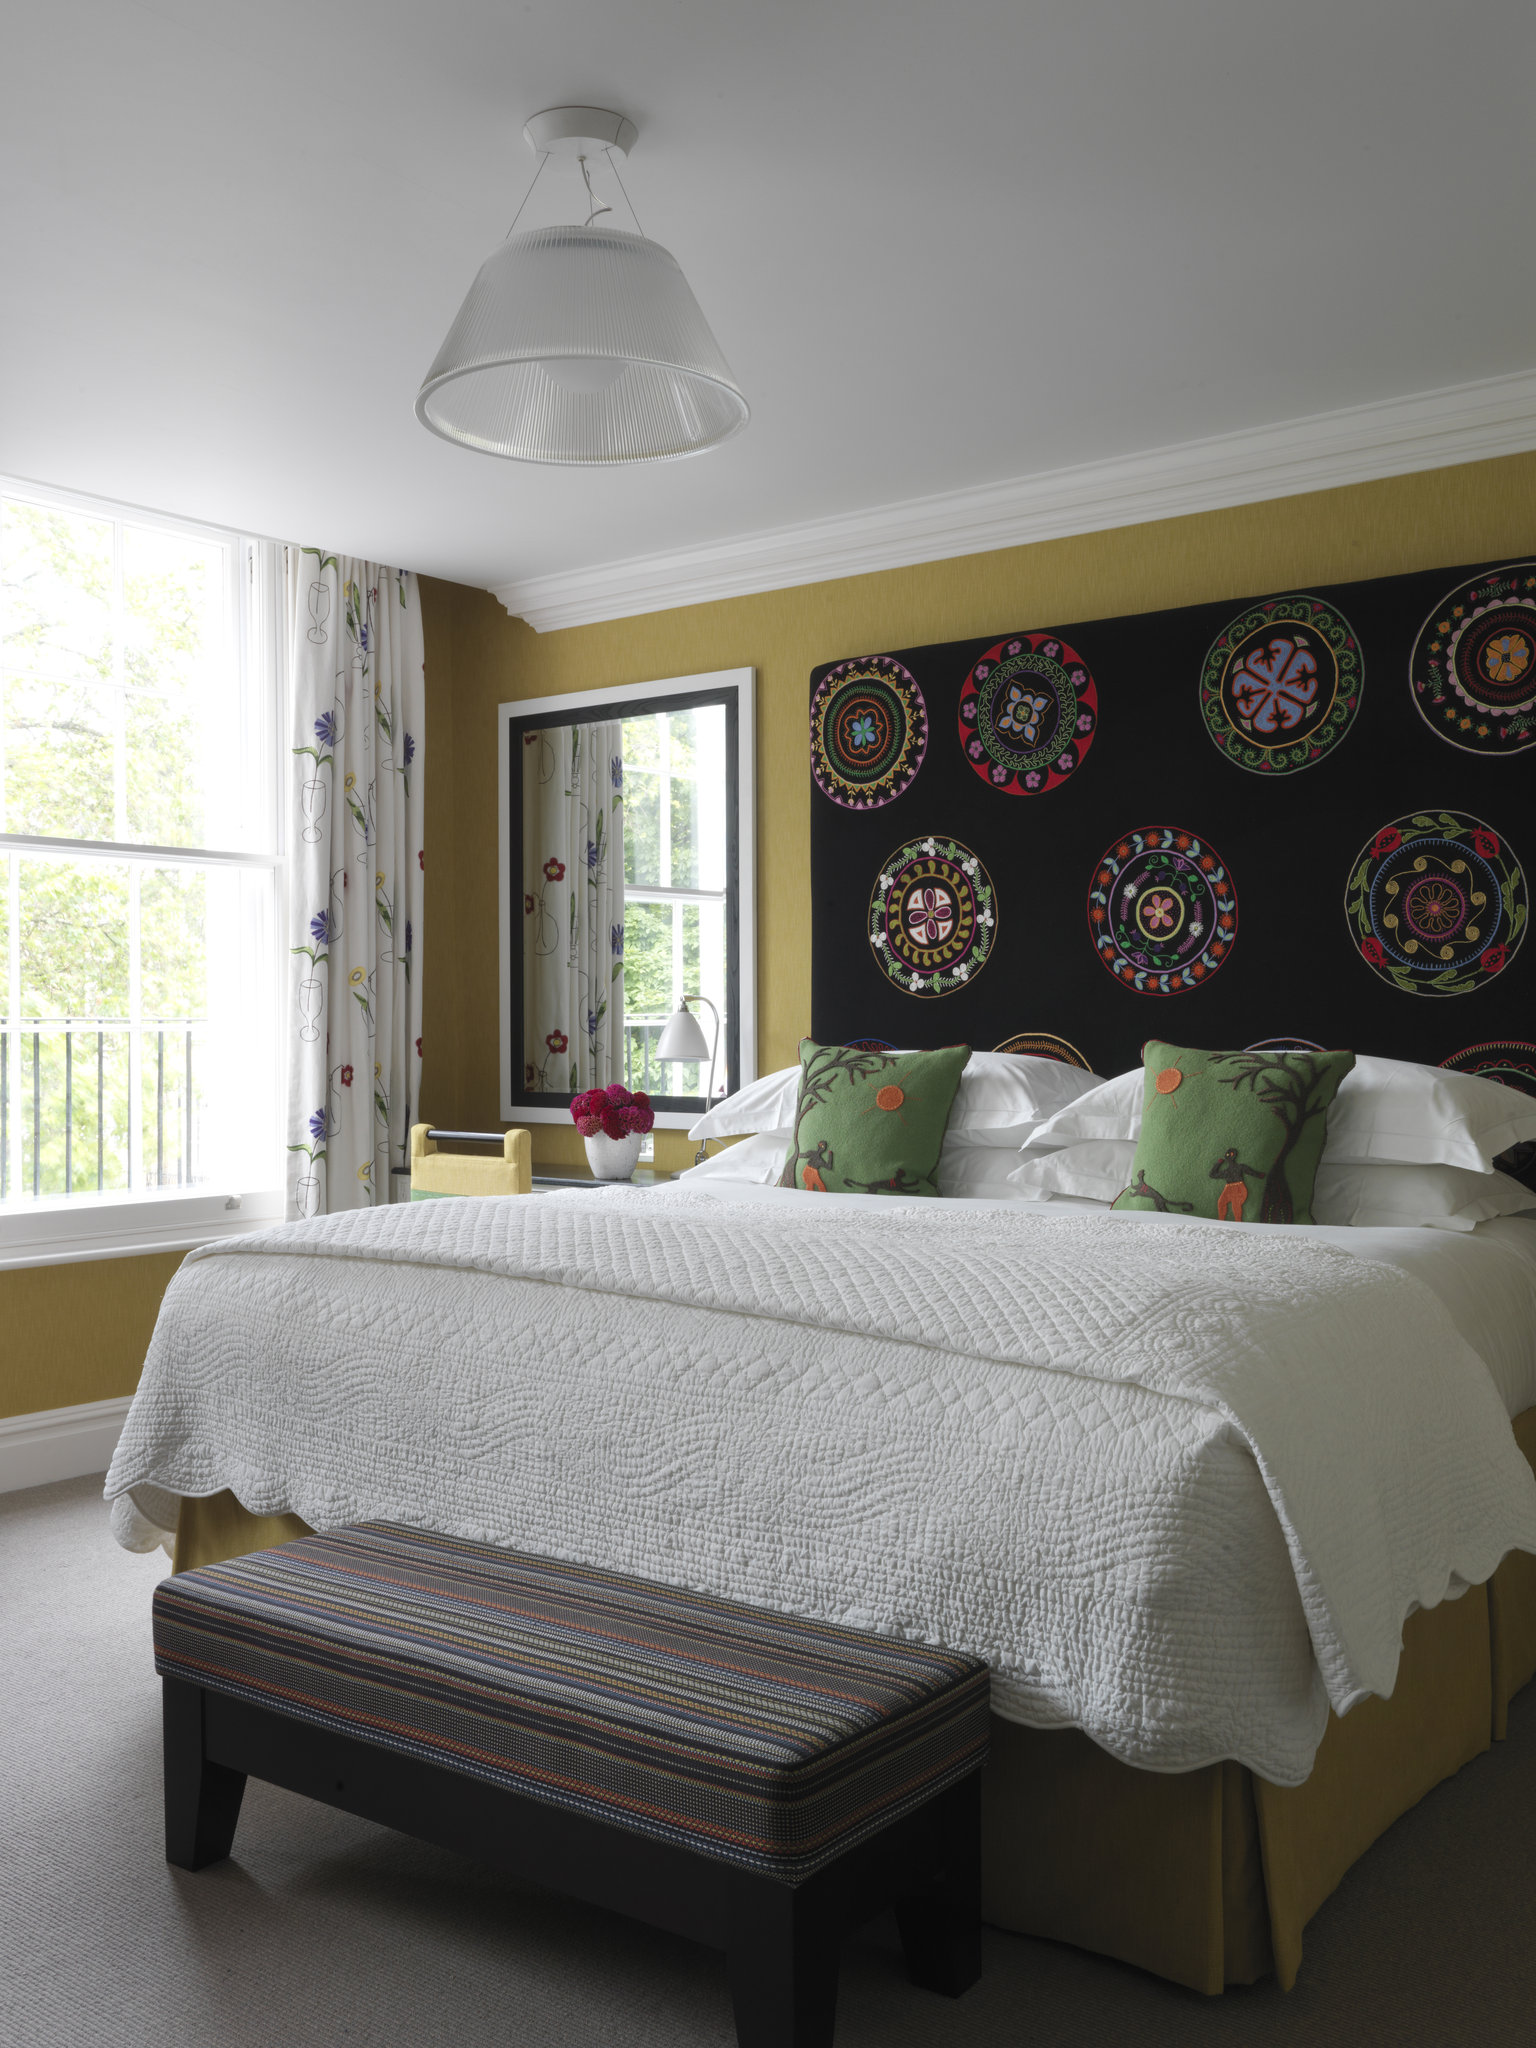 Dorset Square Room